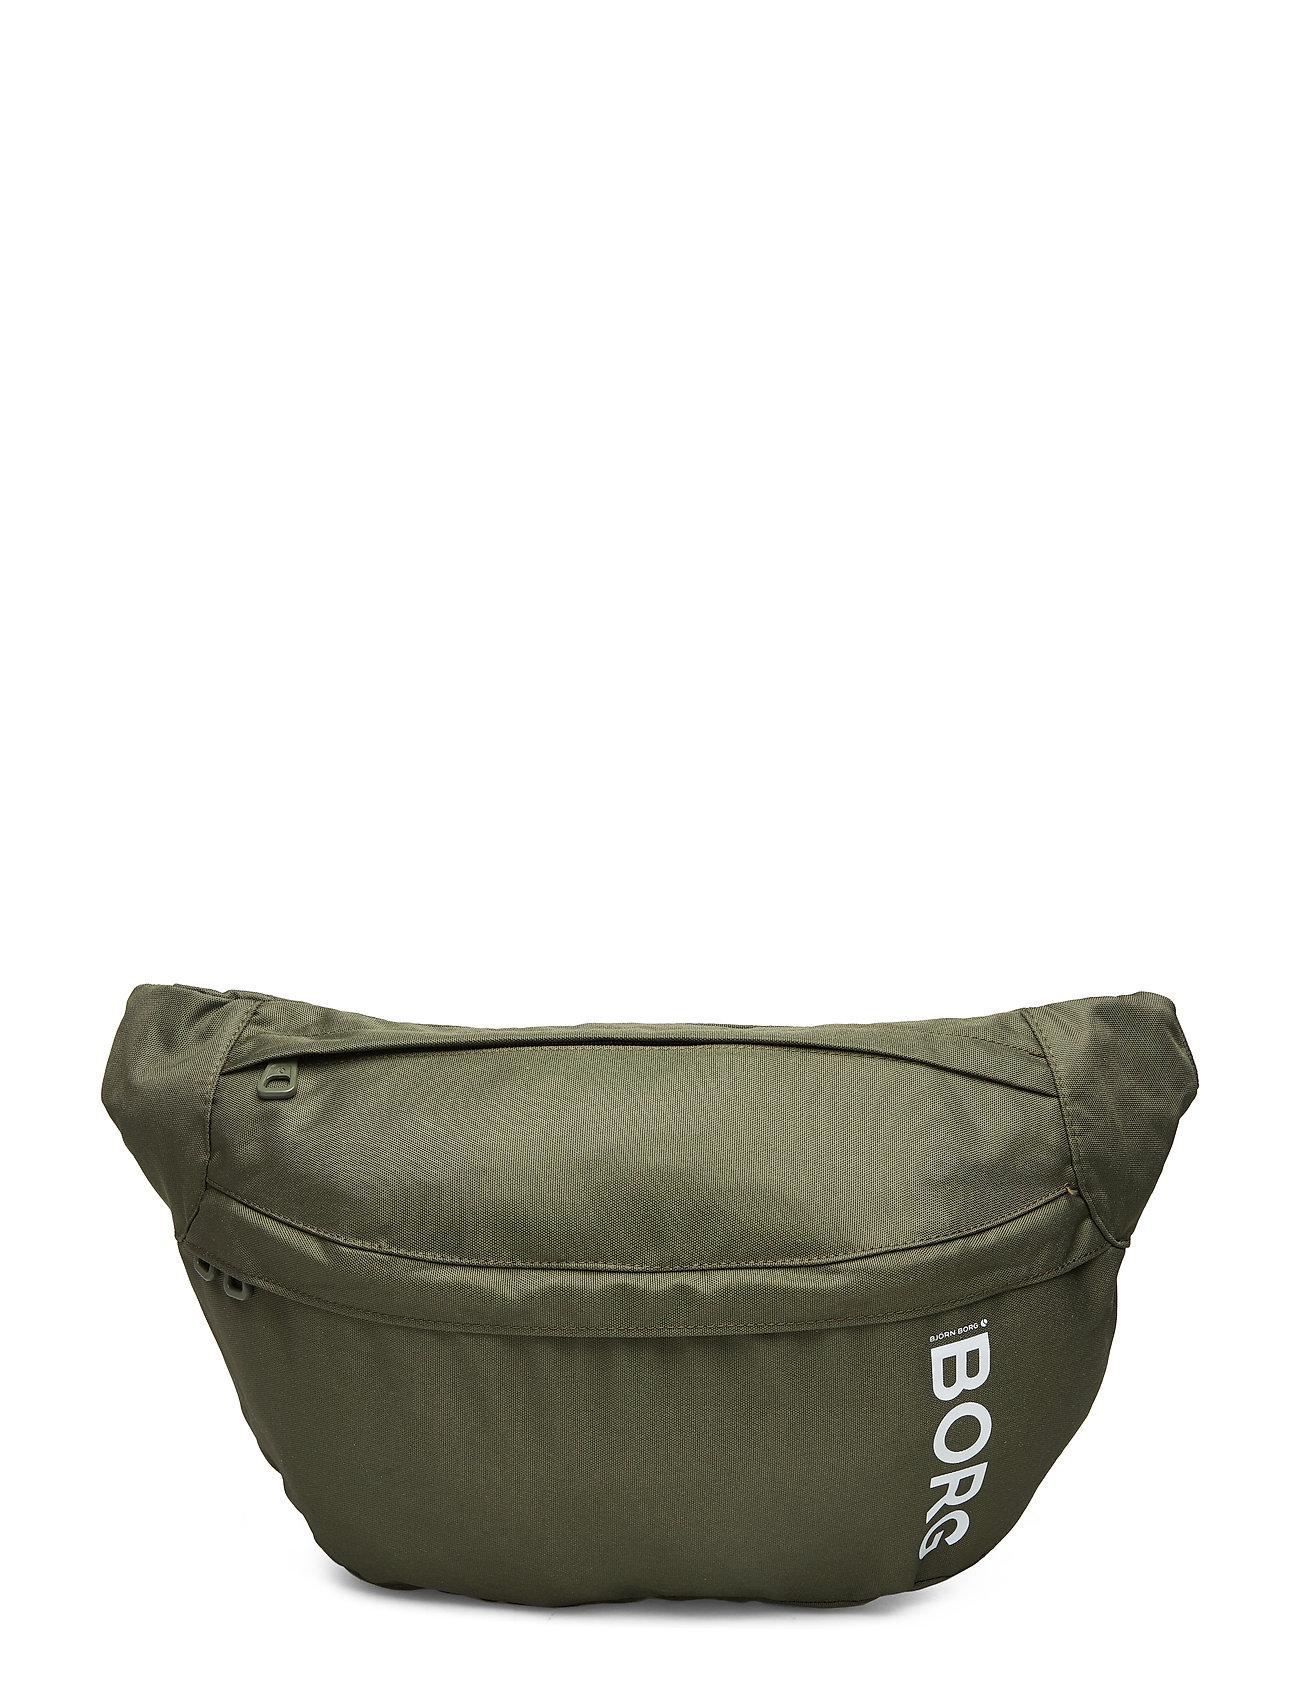 Image of Core7000 Bum Bag Taske Grøn Björn Borg Bags (3210821569)